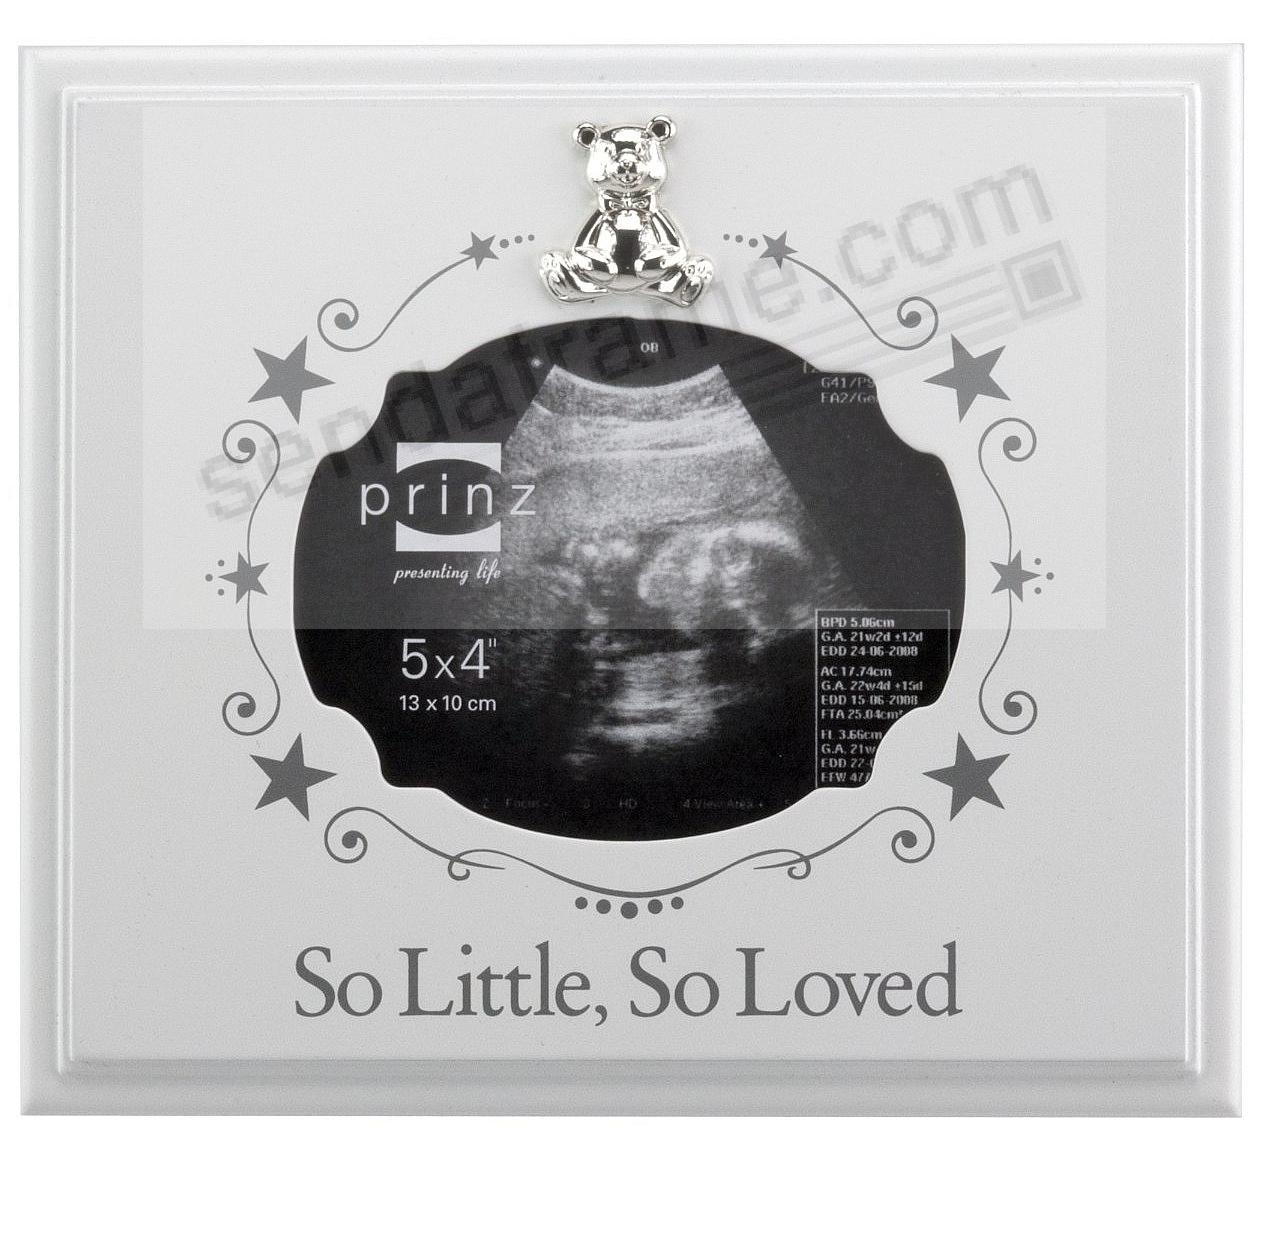 SO LITTLE - SO LOVED Silver Teddy Bear Sonogram frame by Prinz ...